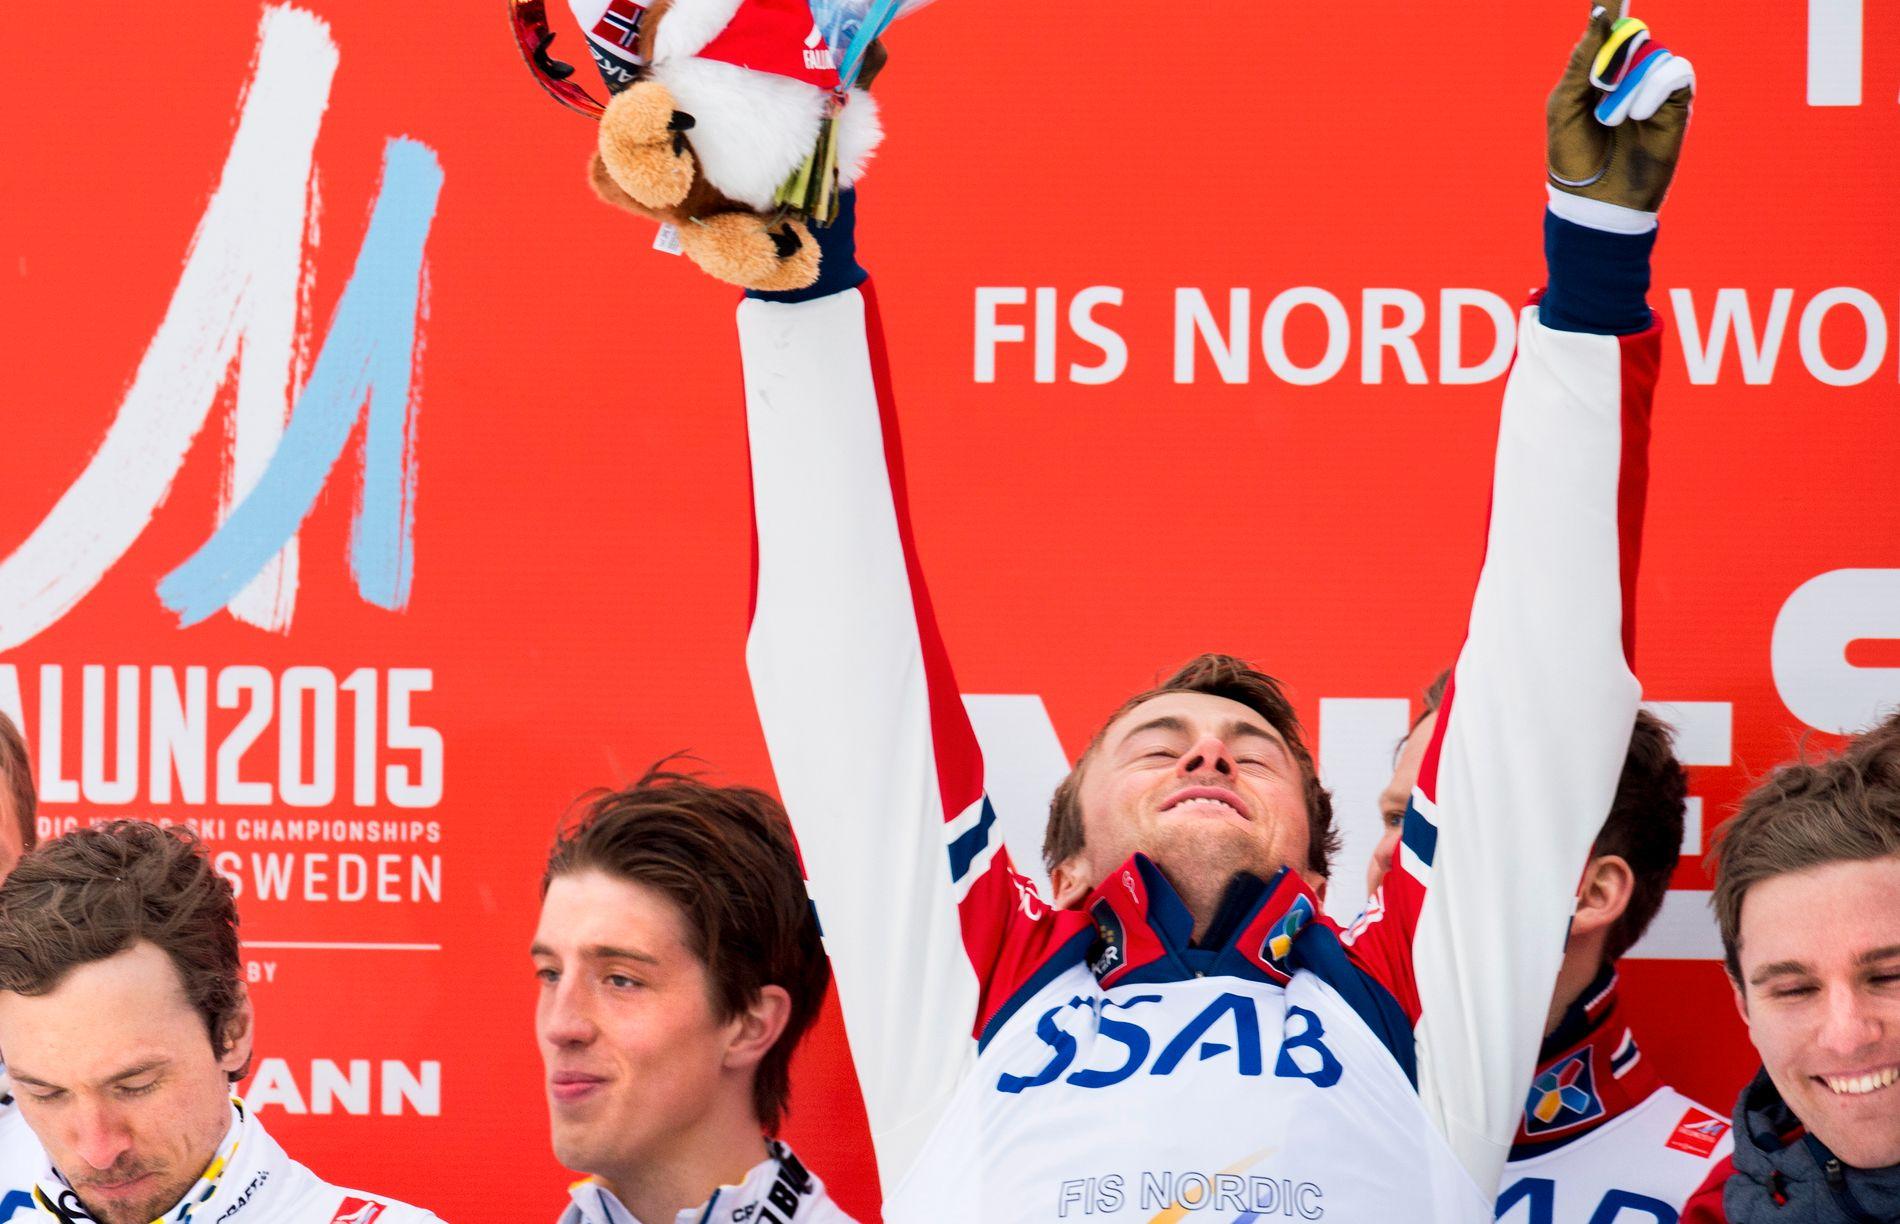 GAMLE RIVALER:  Petter Northug satte Calle Halvfarsson (til venstre)  på plass i spurten da Norge slo Sverige i VM-stafetten i Falun i 2015. Til venstre Johan Olsson og til høyre Didrik Tønseth.